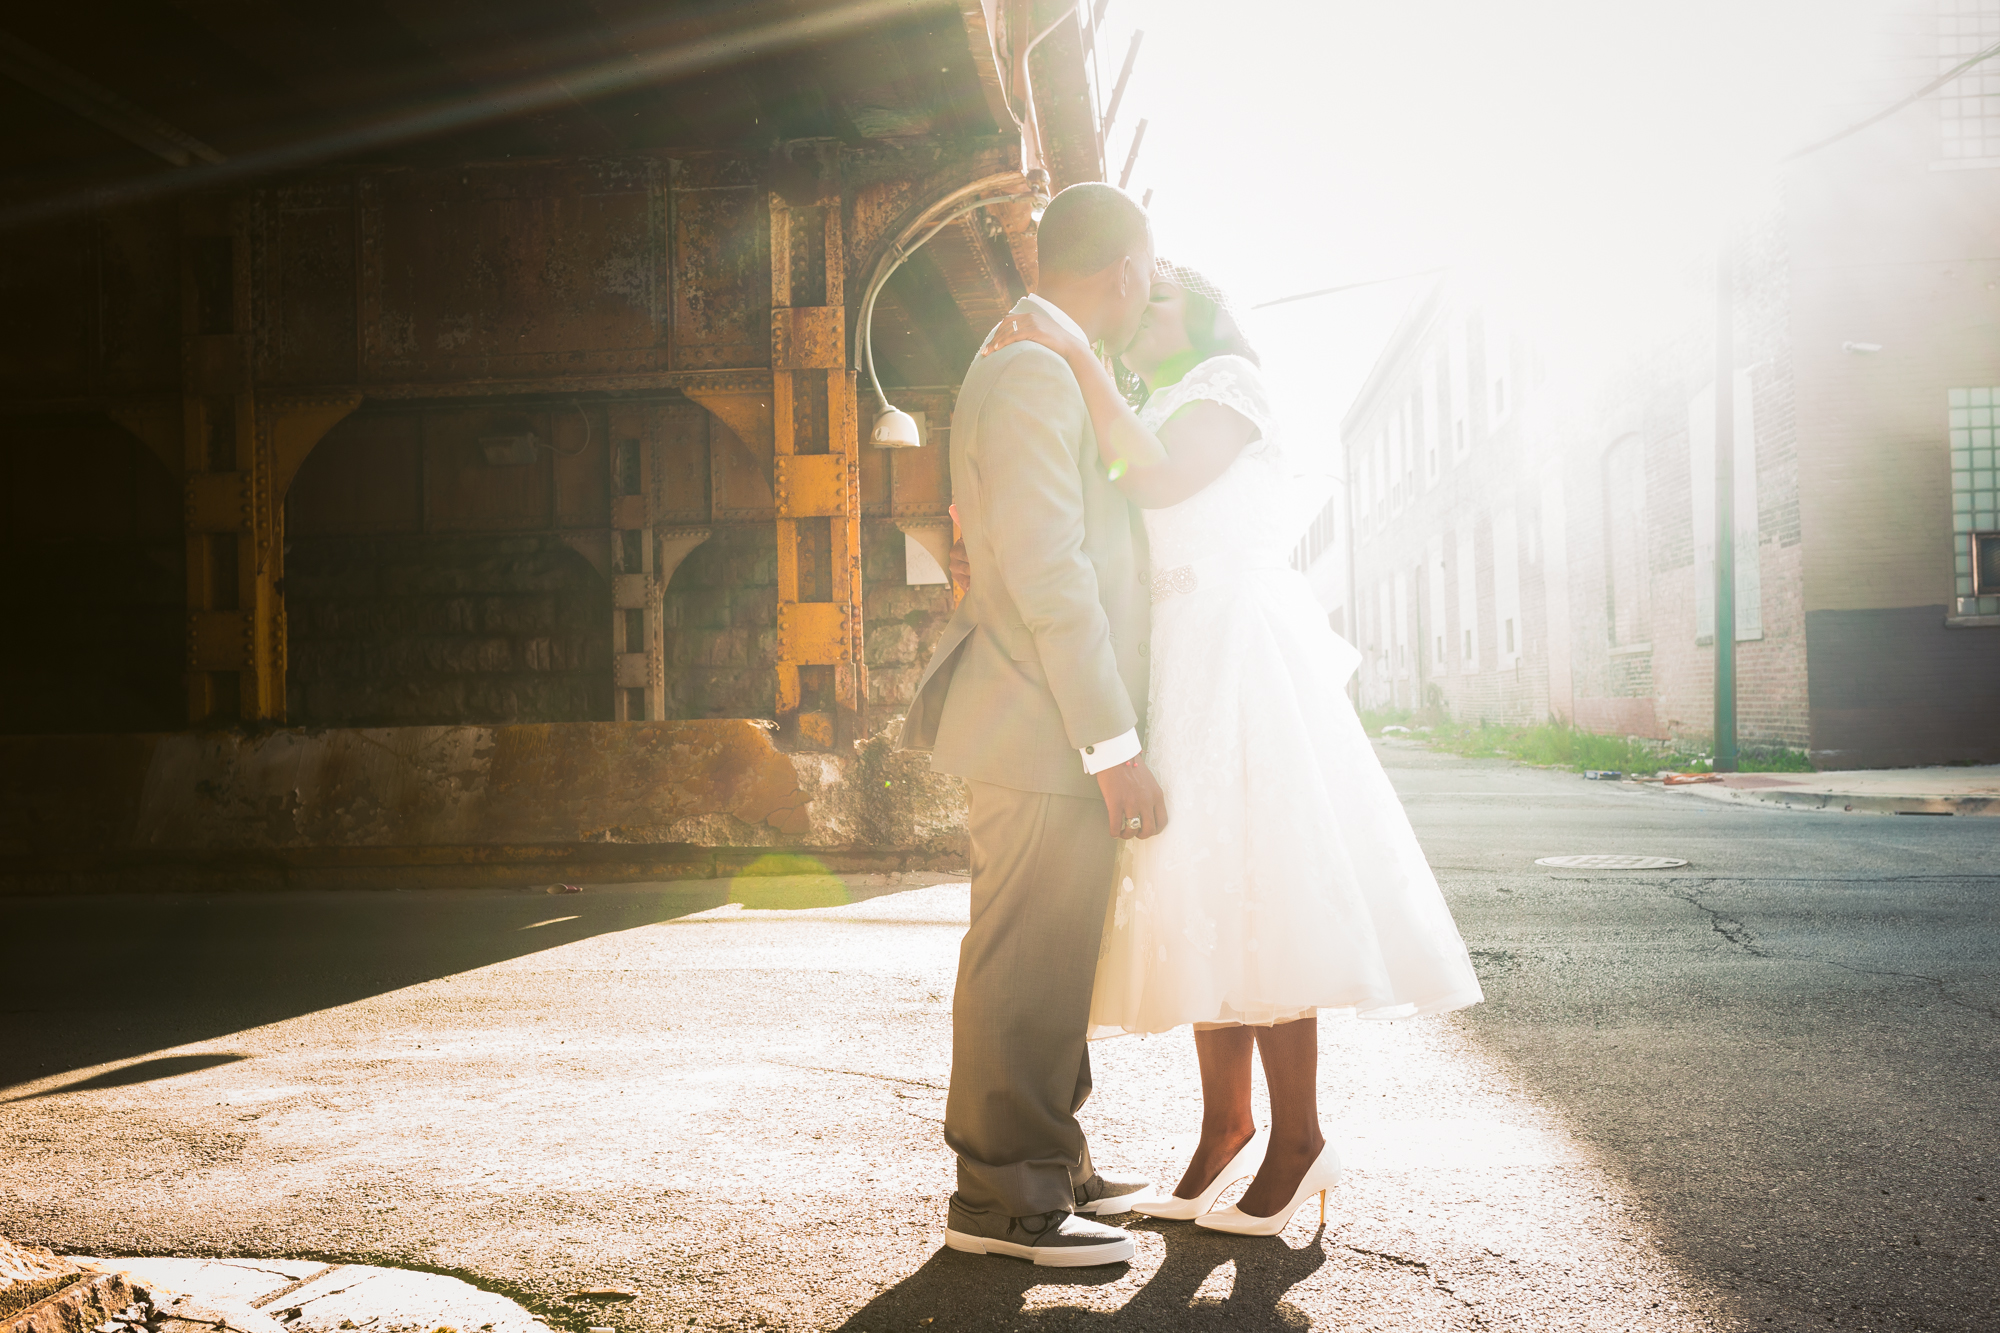 BJ-Oriana-Koren-Weddings-4203.jpg